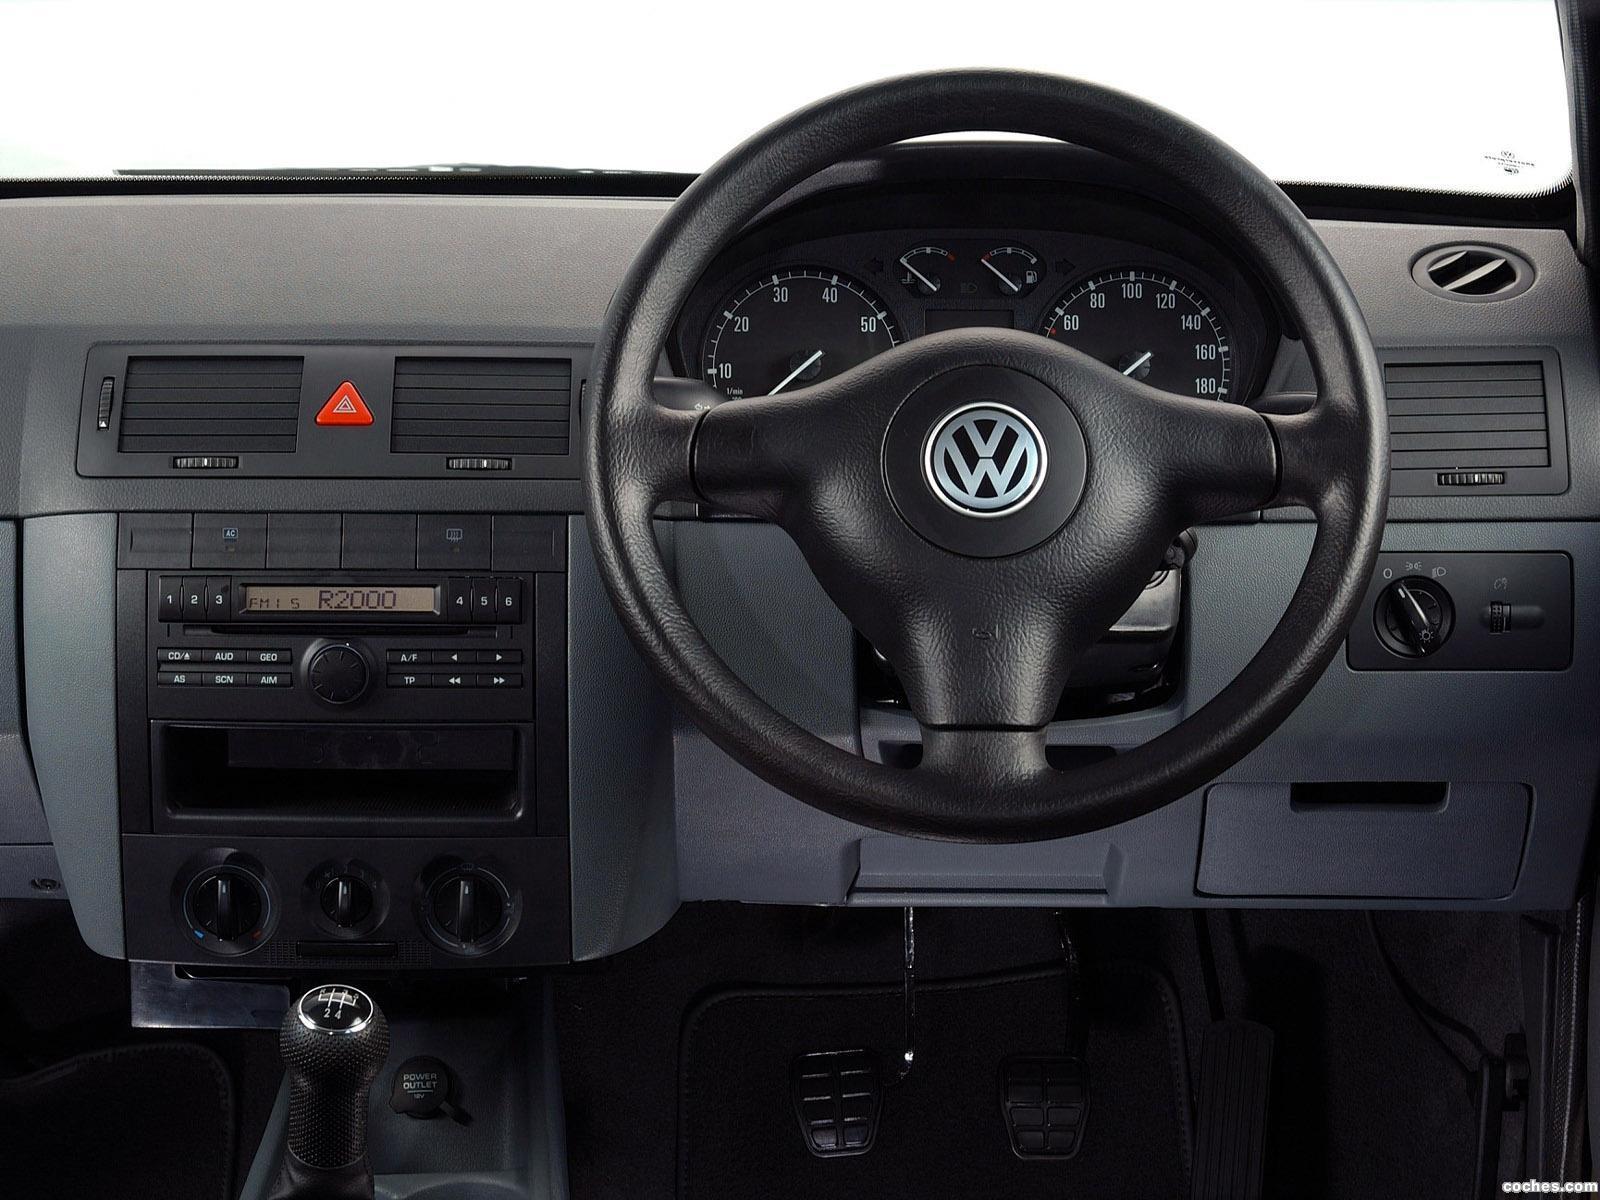 Foto 8 de Volkswagen Citi Life 2003